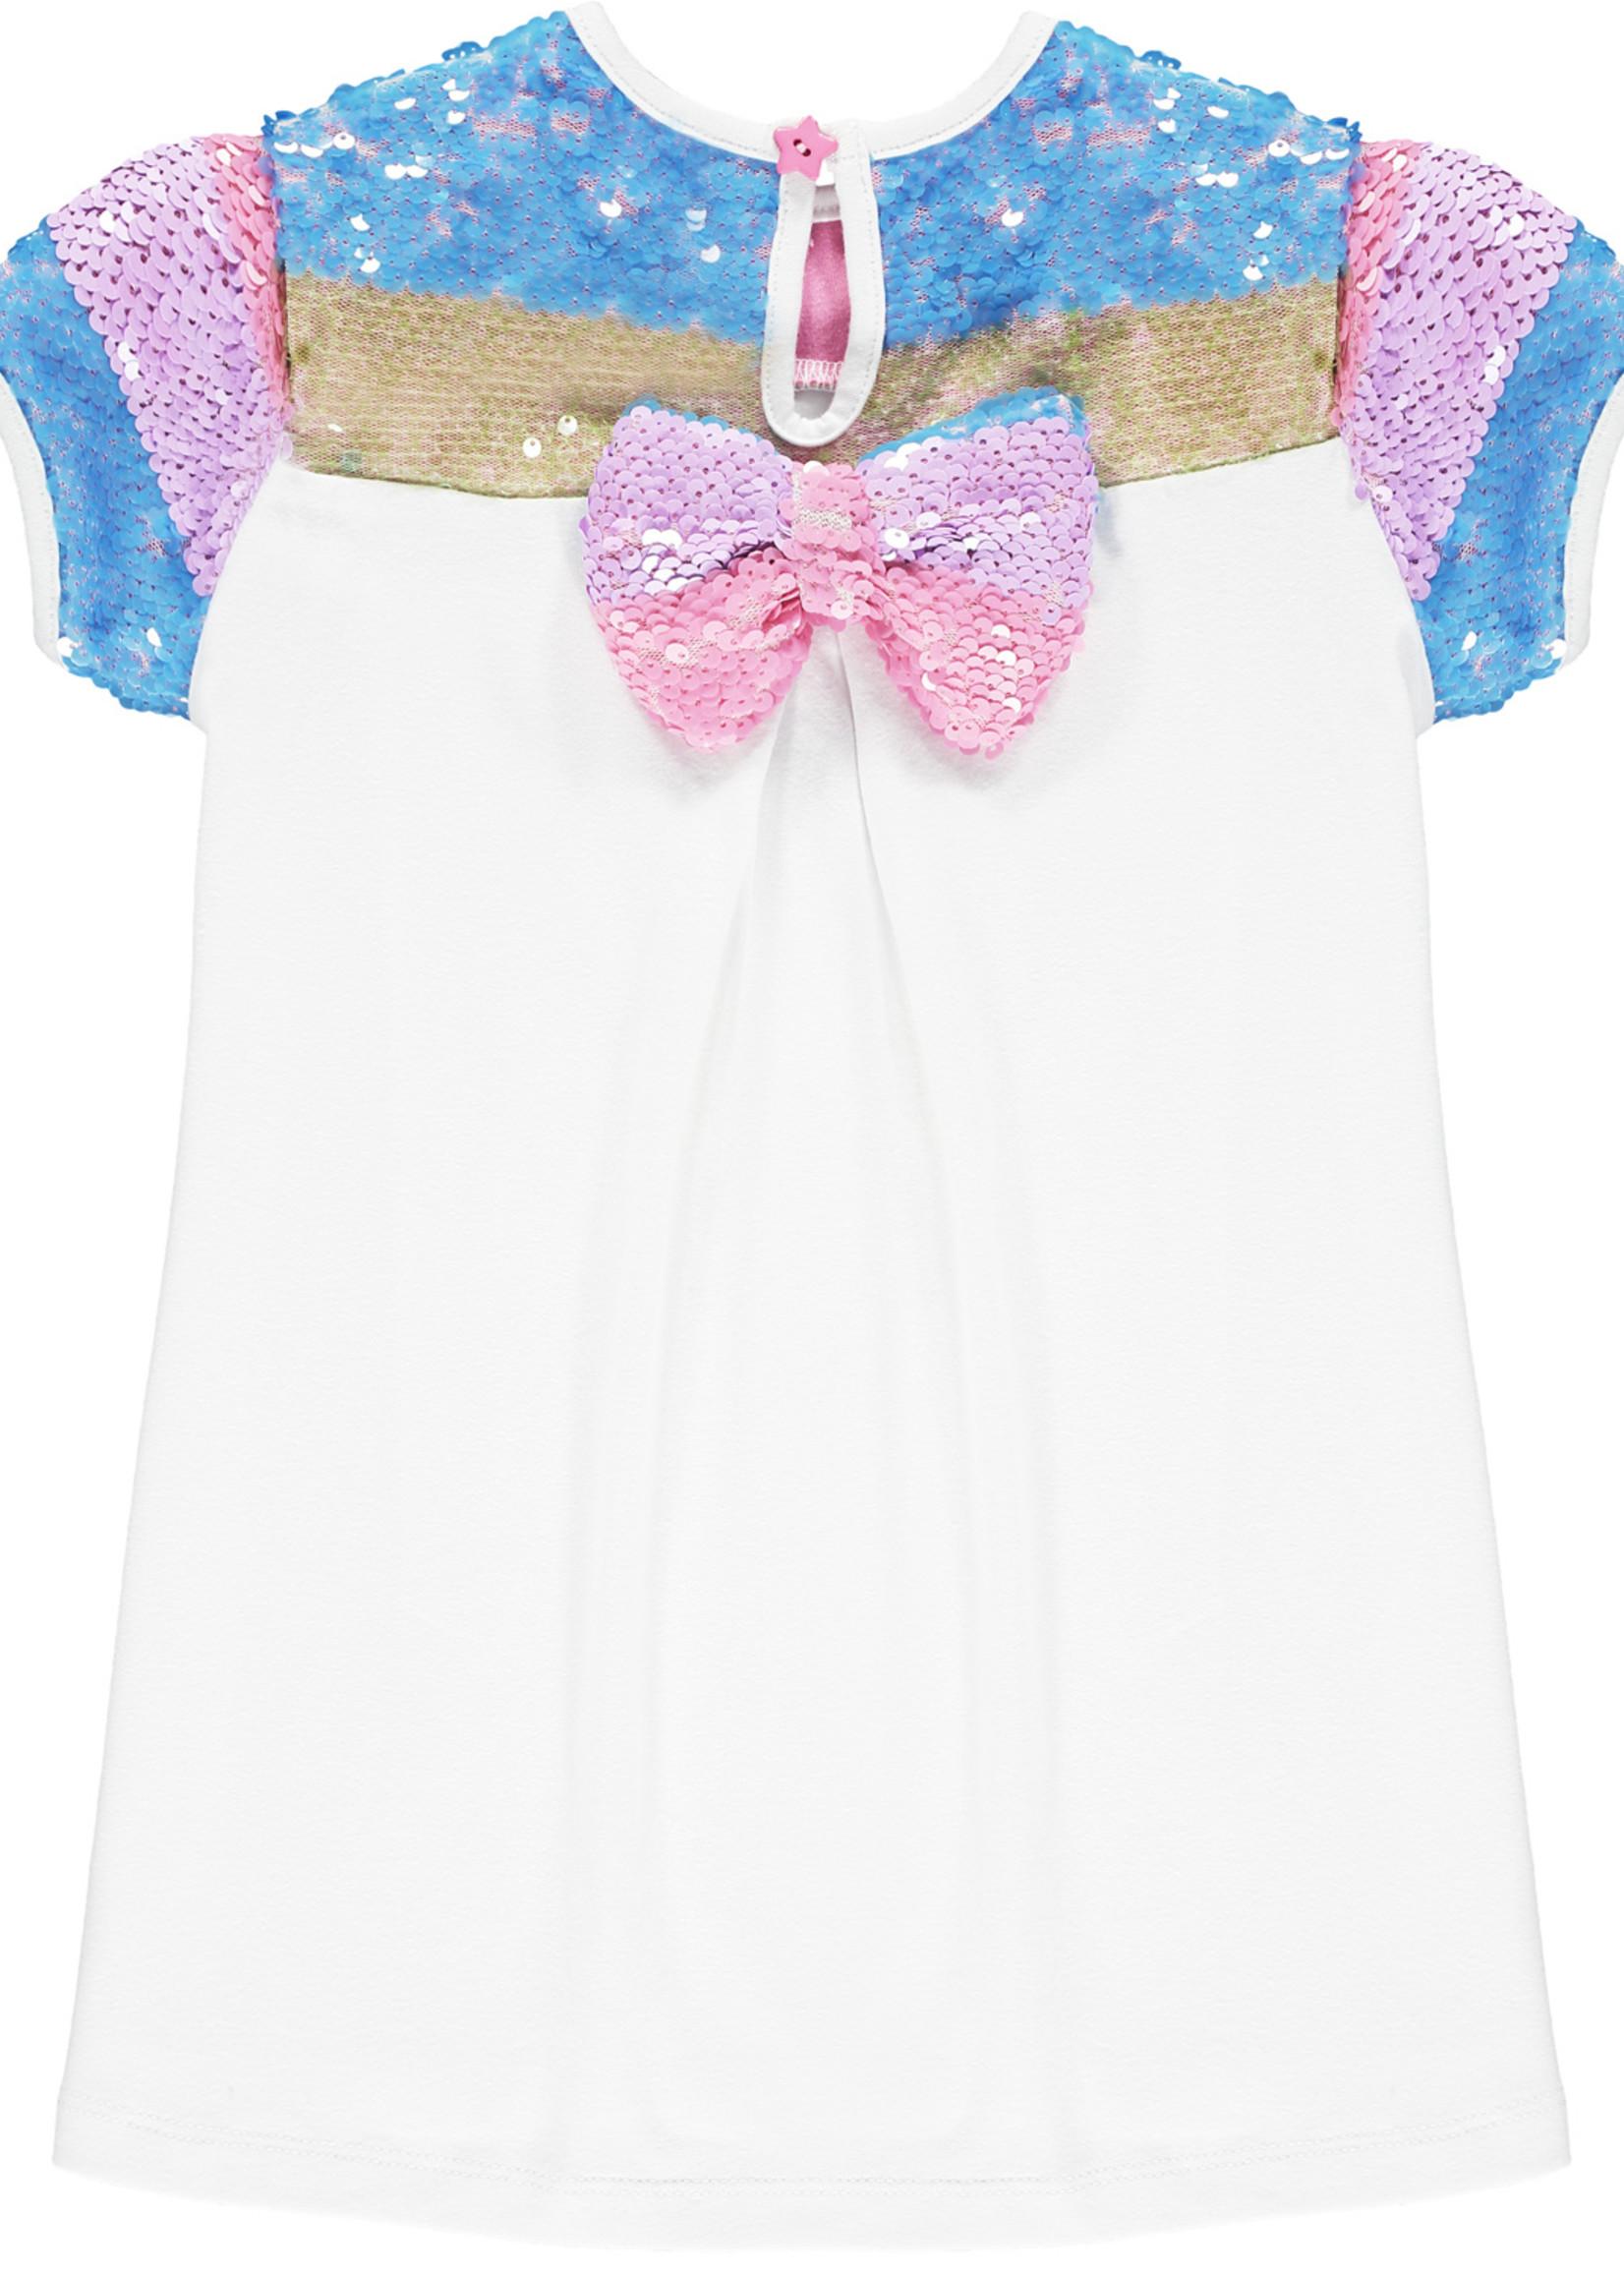 A Dee Nan set Rainbow sequin top